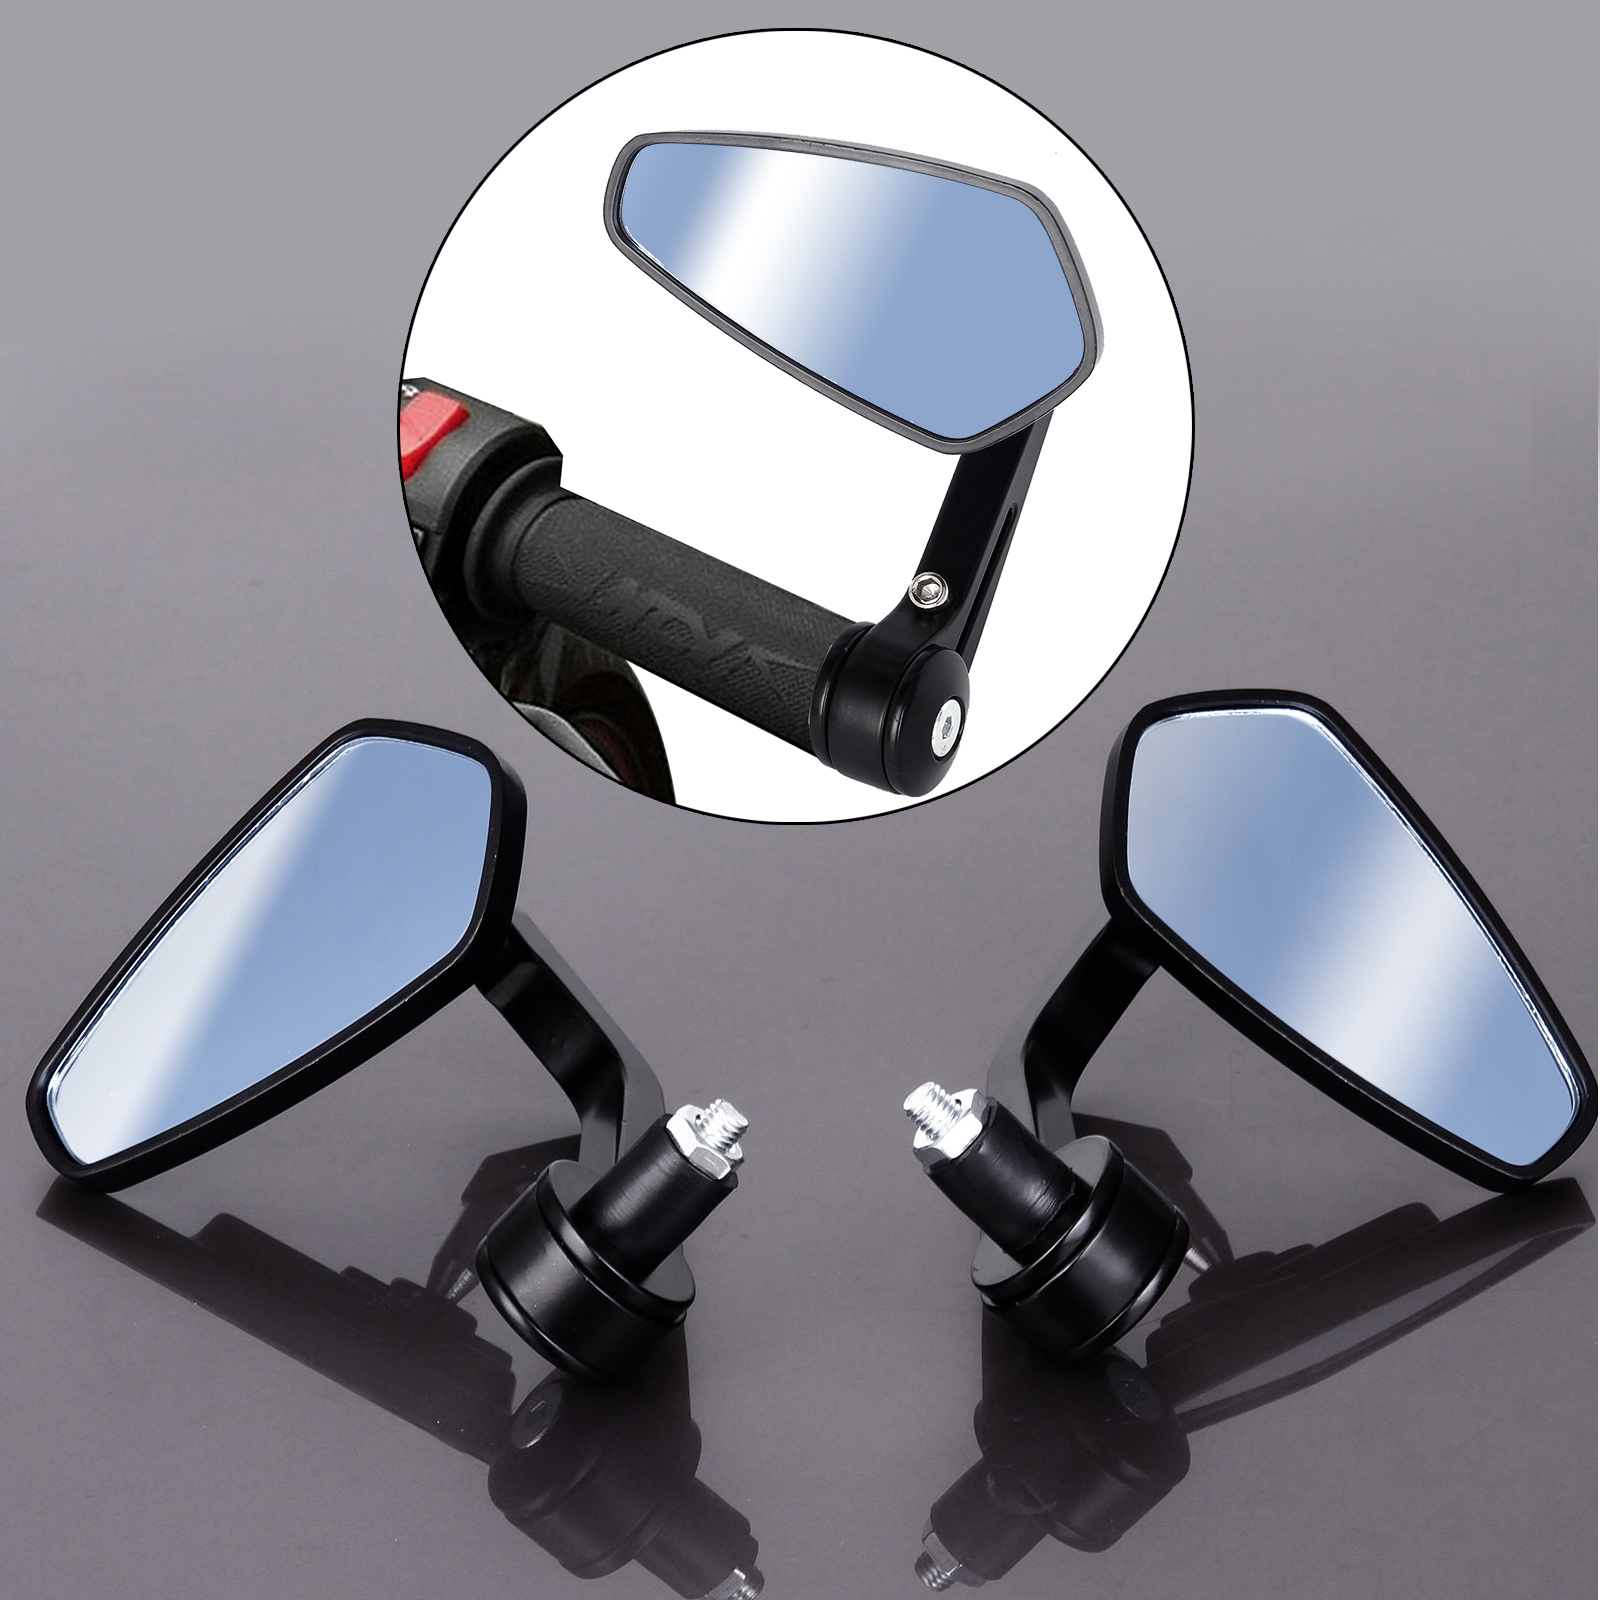 7 8 22mm lenker spiegel roller motorrad quad r ckspiegel for Spiegel quad